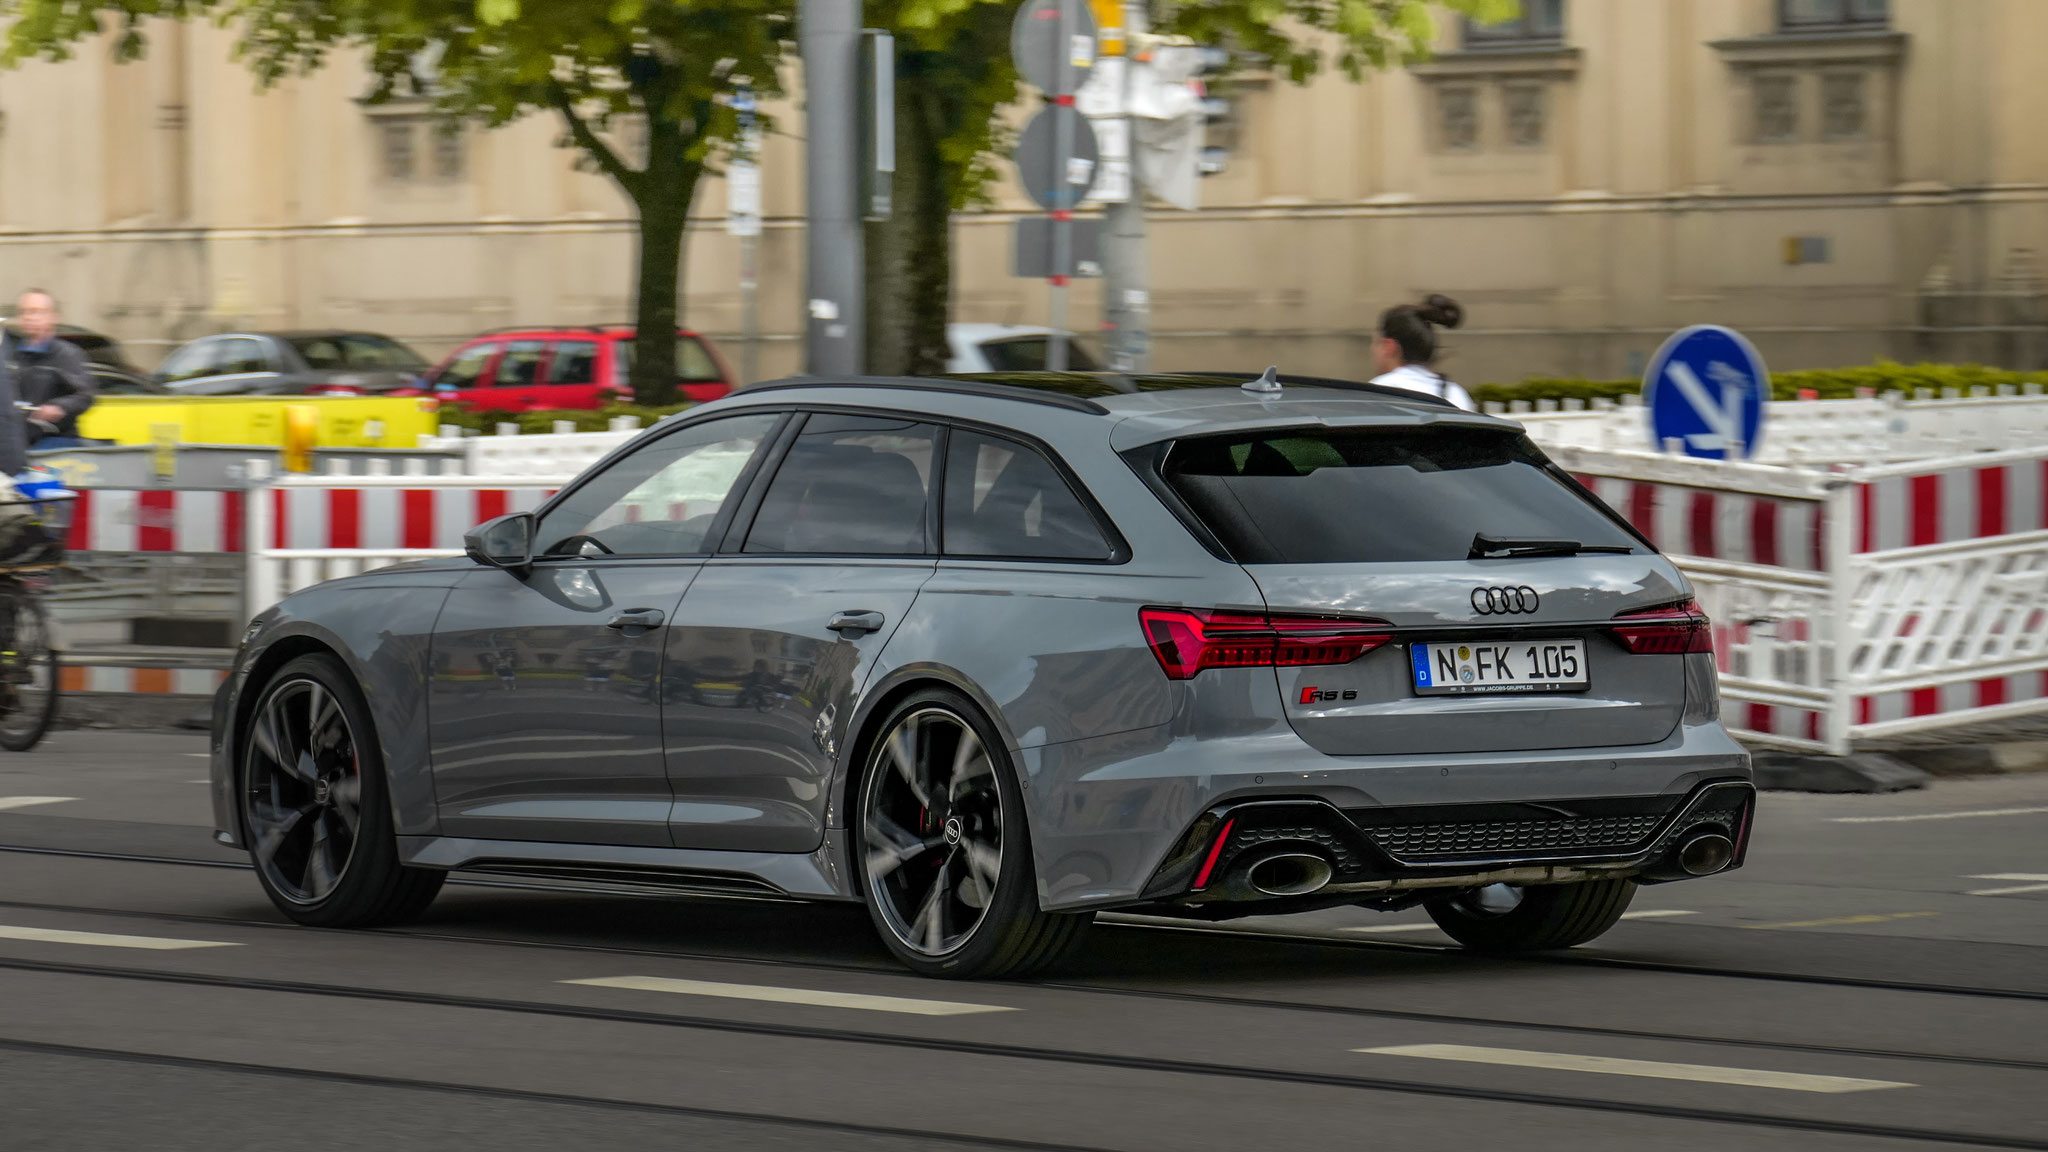 Audi RS6 - N-FK-105